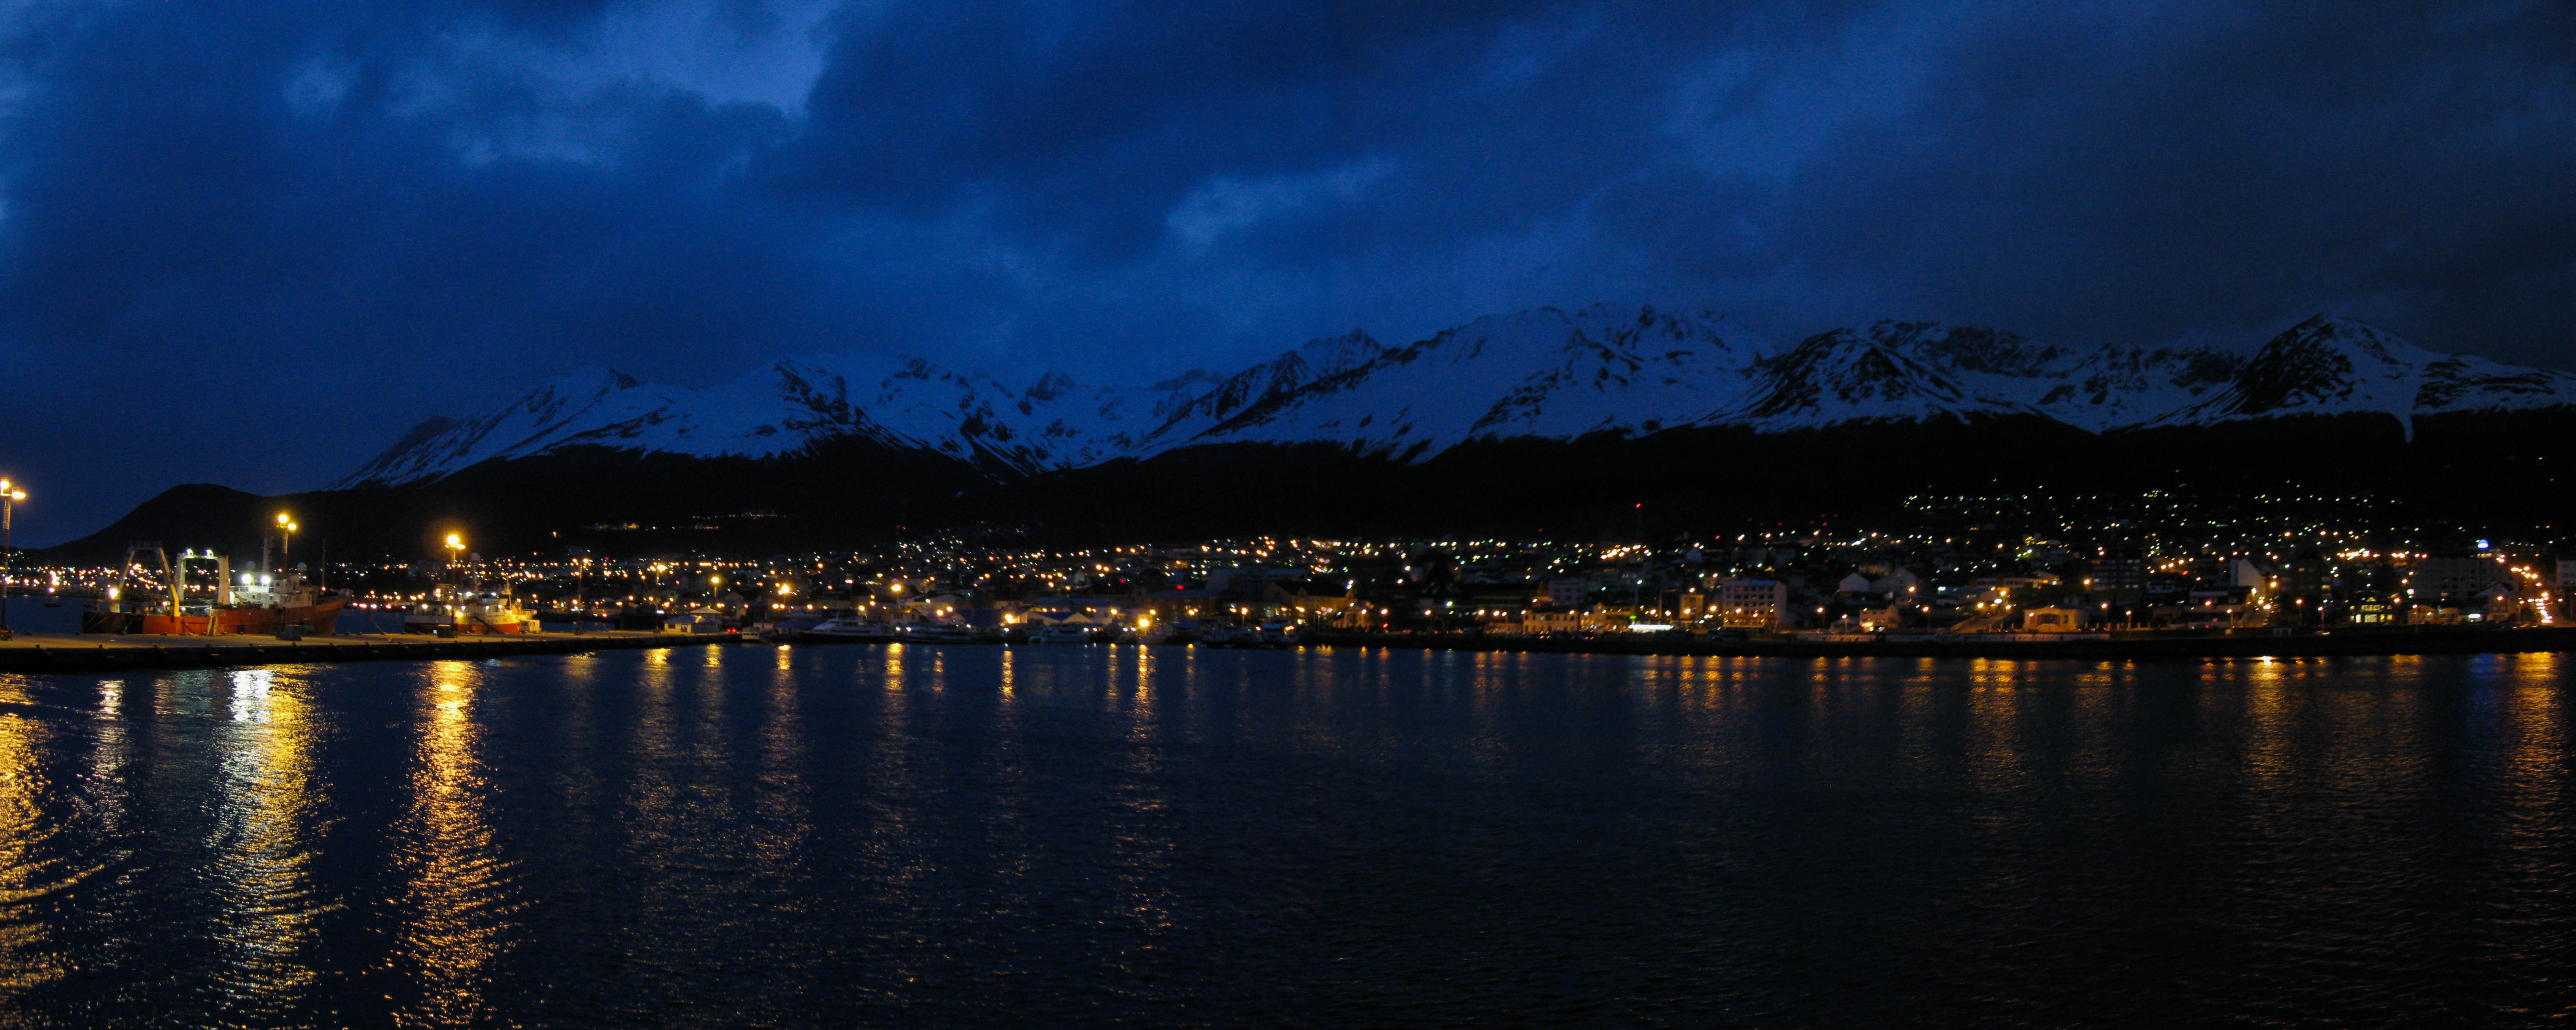 Ushuaia - night panoramic